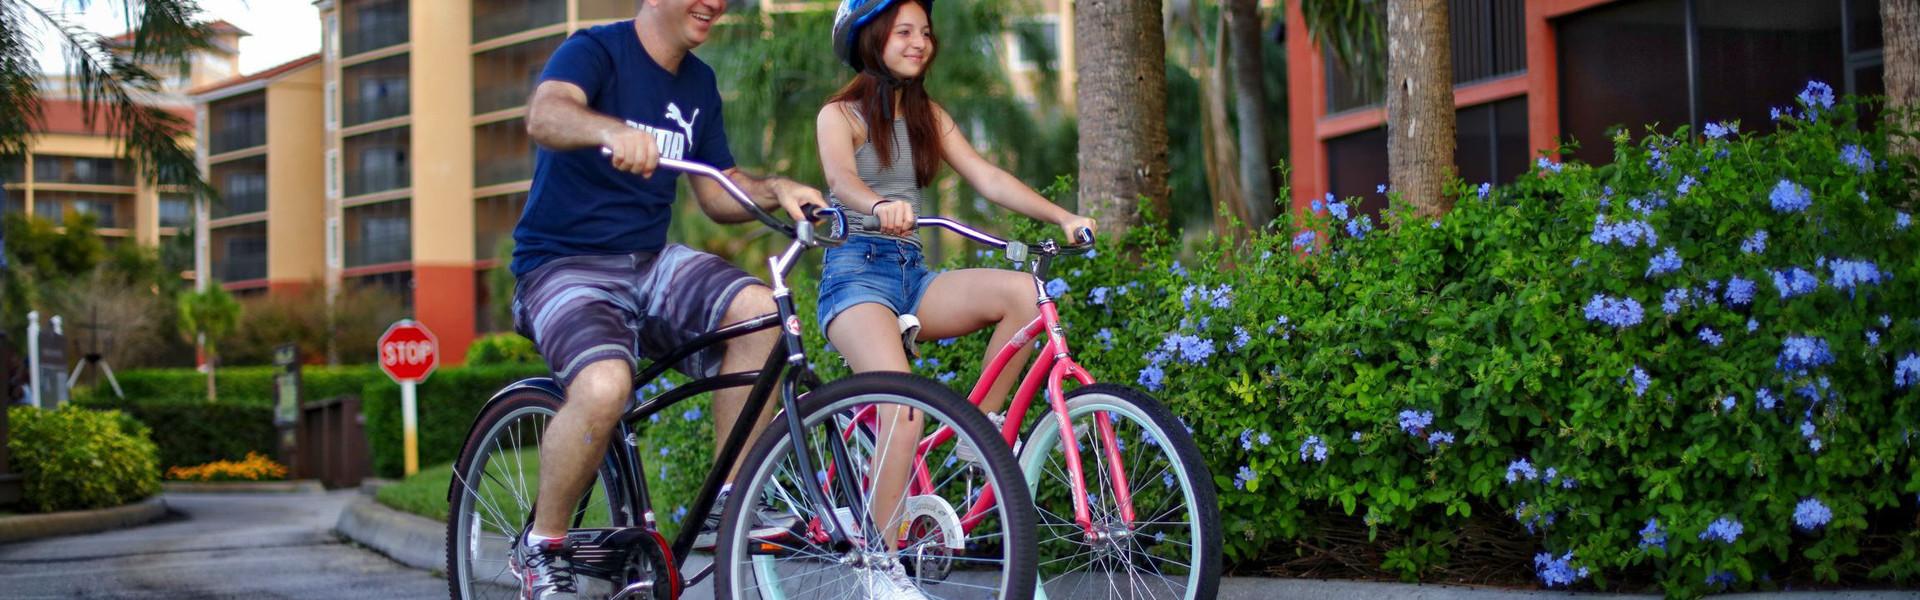 Hotel Bicycle Rental   Rent a Bike at Our Orlando Resort   Westgate Lakes Resort & Spa